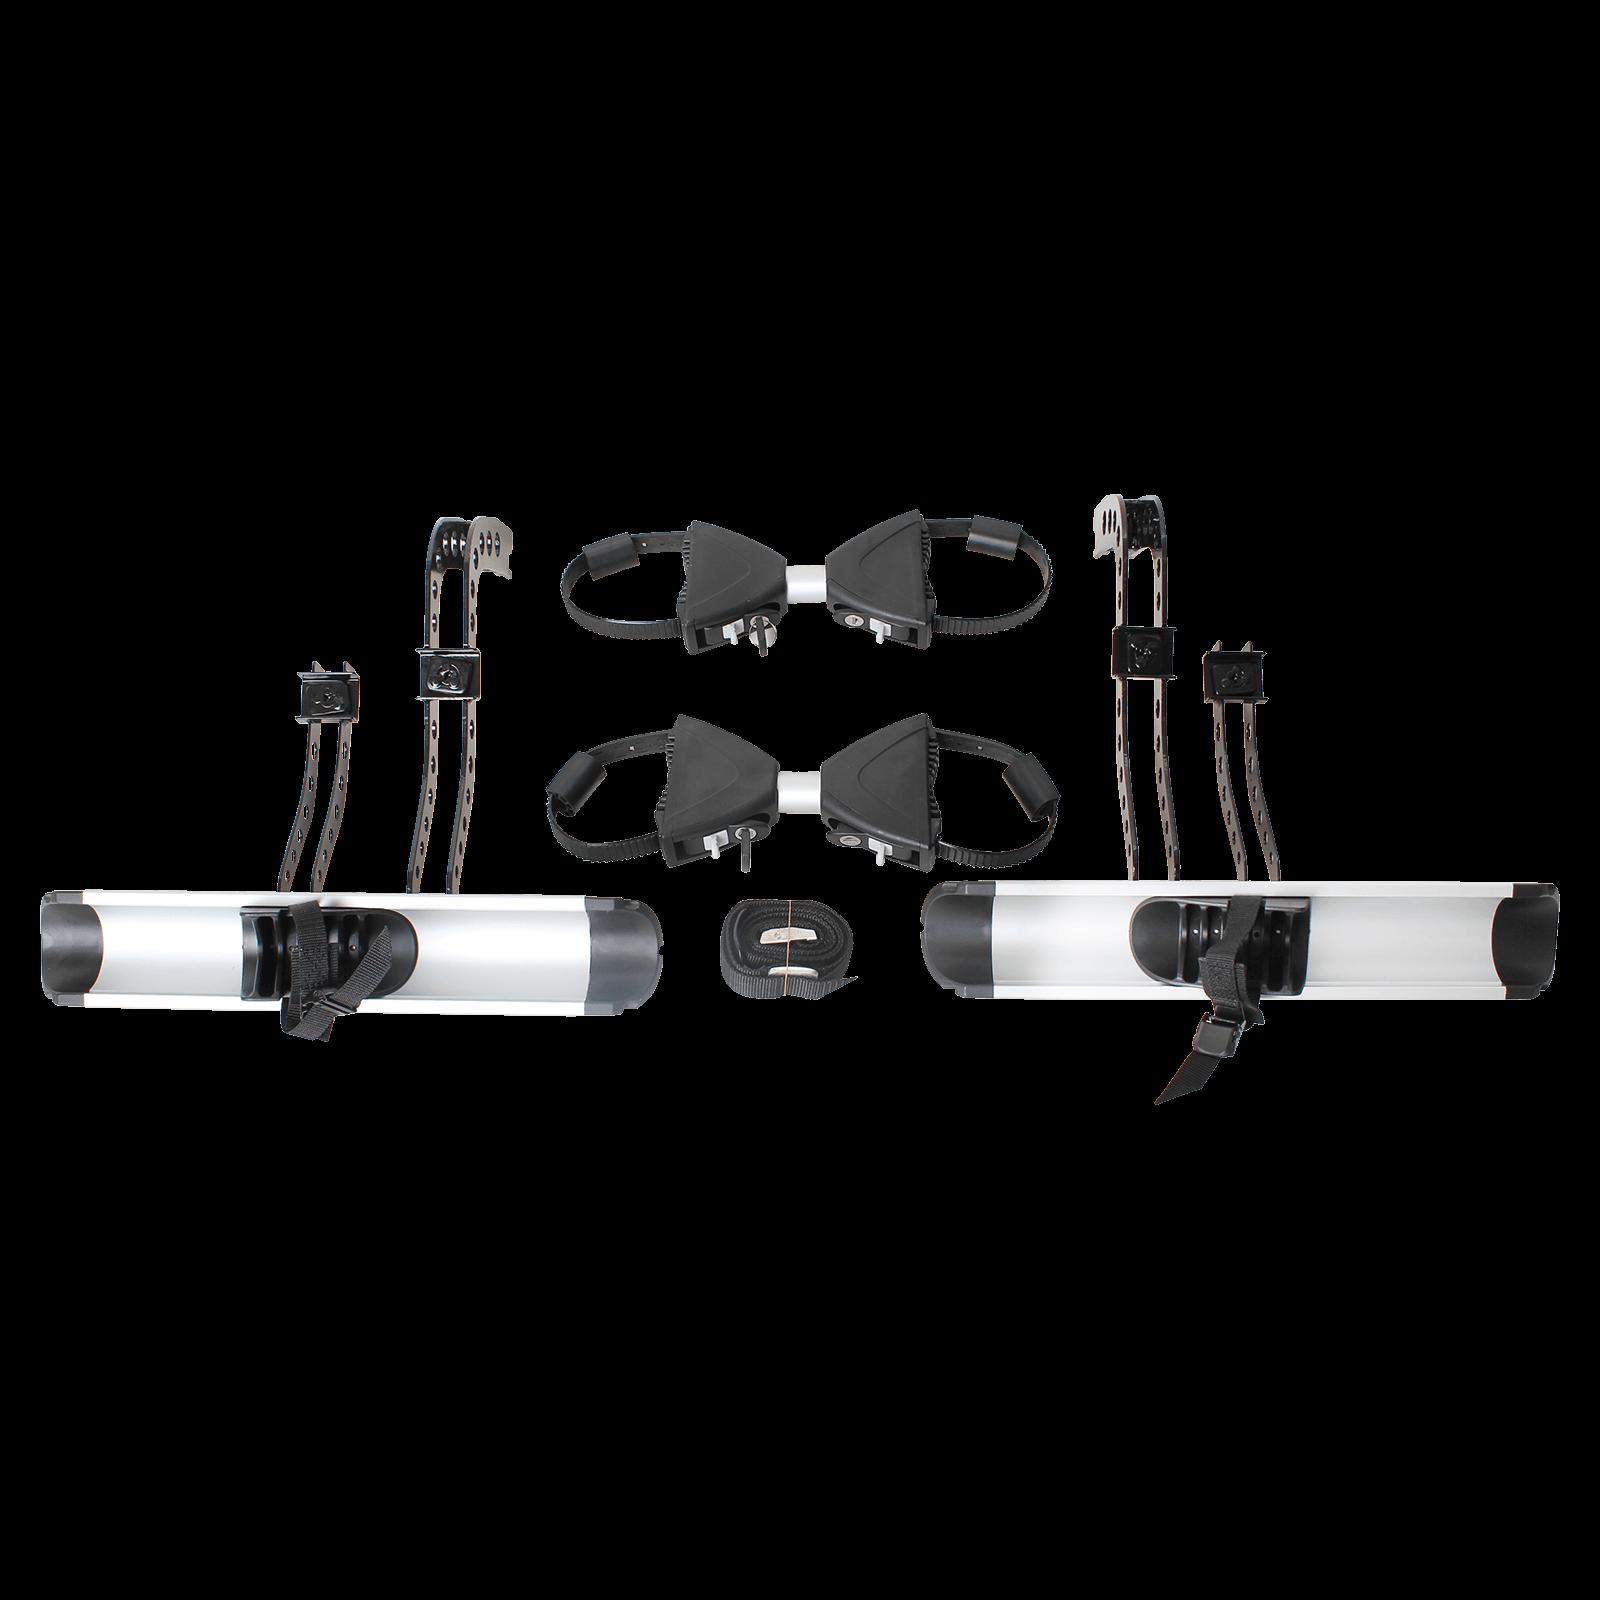 erweiterung fahrradtr ger mft backpower f r 4 fahrrad bei rameder. Black Bedroom Furniture Sets. Home Design Ideas